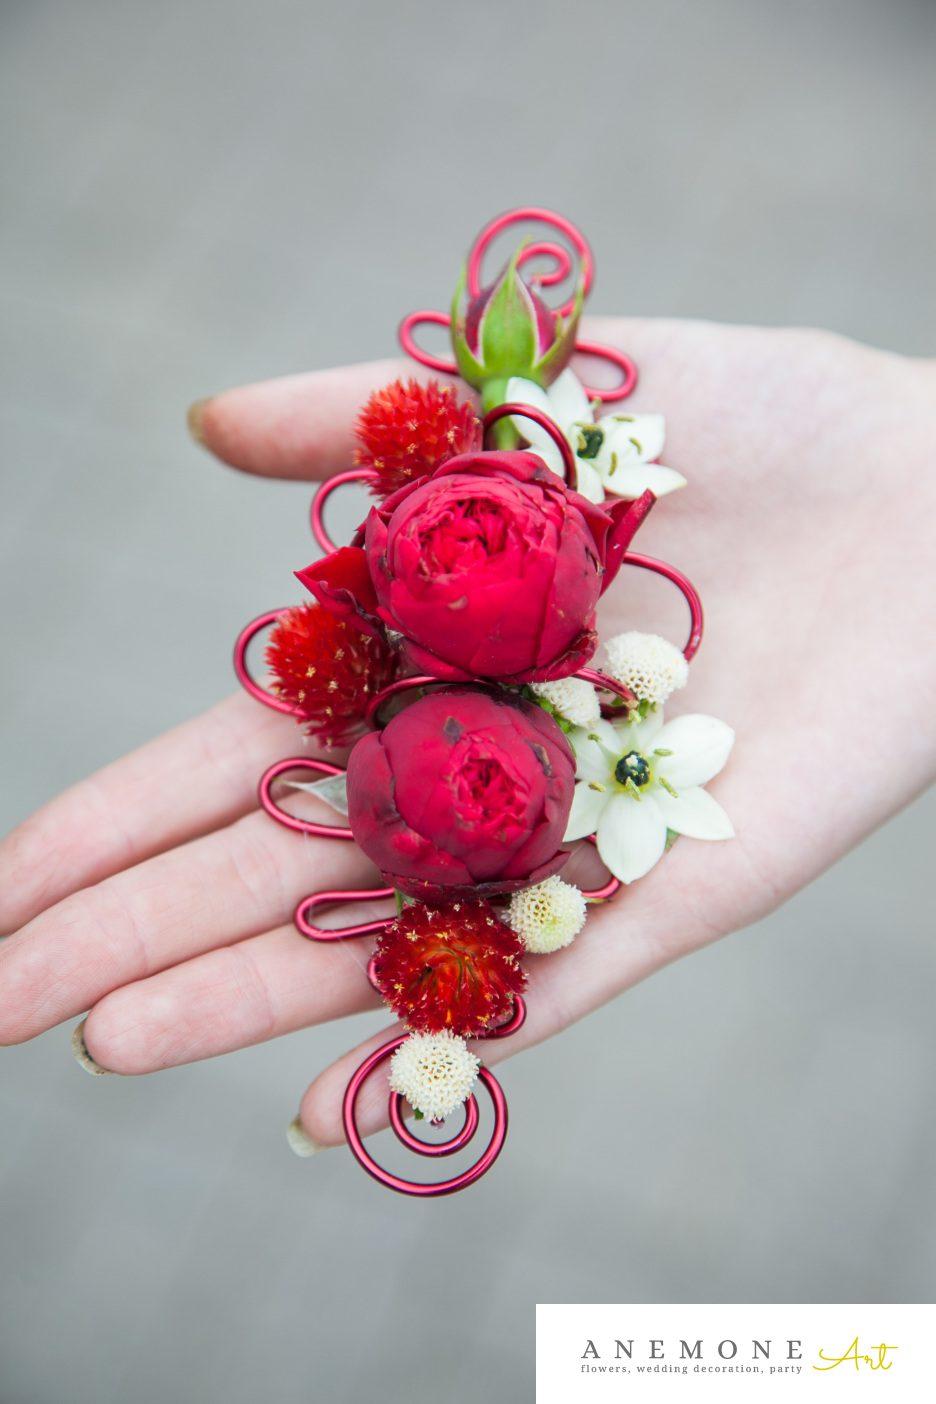 Poza, foto cu Flori de nunta cocarda in Arad, Timisoara, Oradea (wedding flowers, bouquets) nunta Arad, Timisoara, Oradea